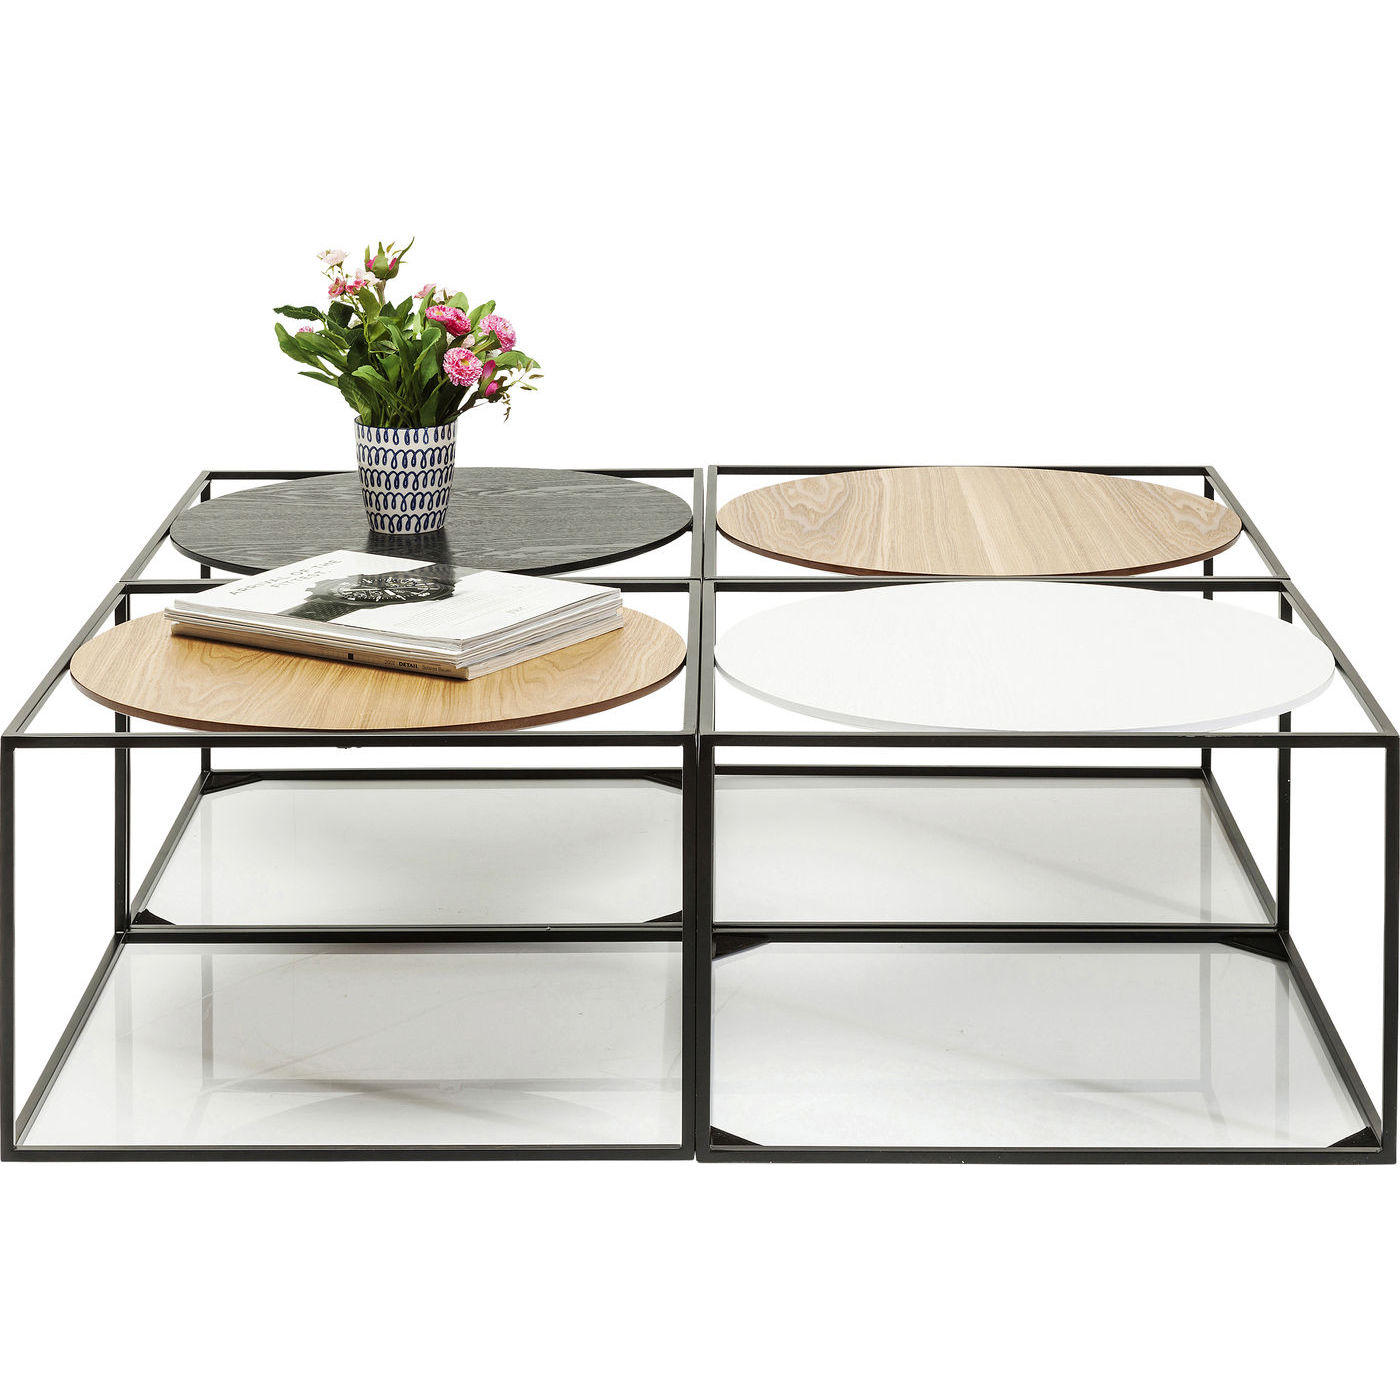 kare design – Kare design sofabord, quattro circles 100x100cm på boboonline.dk